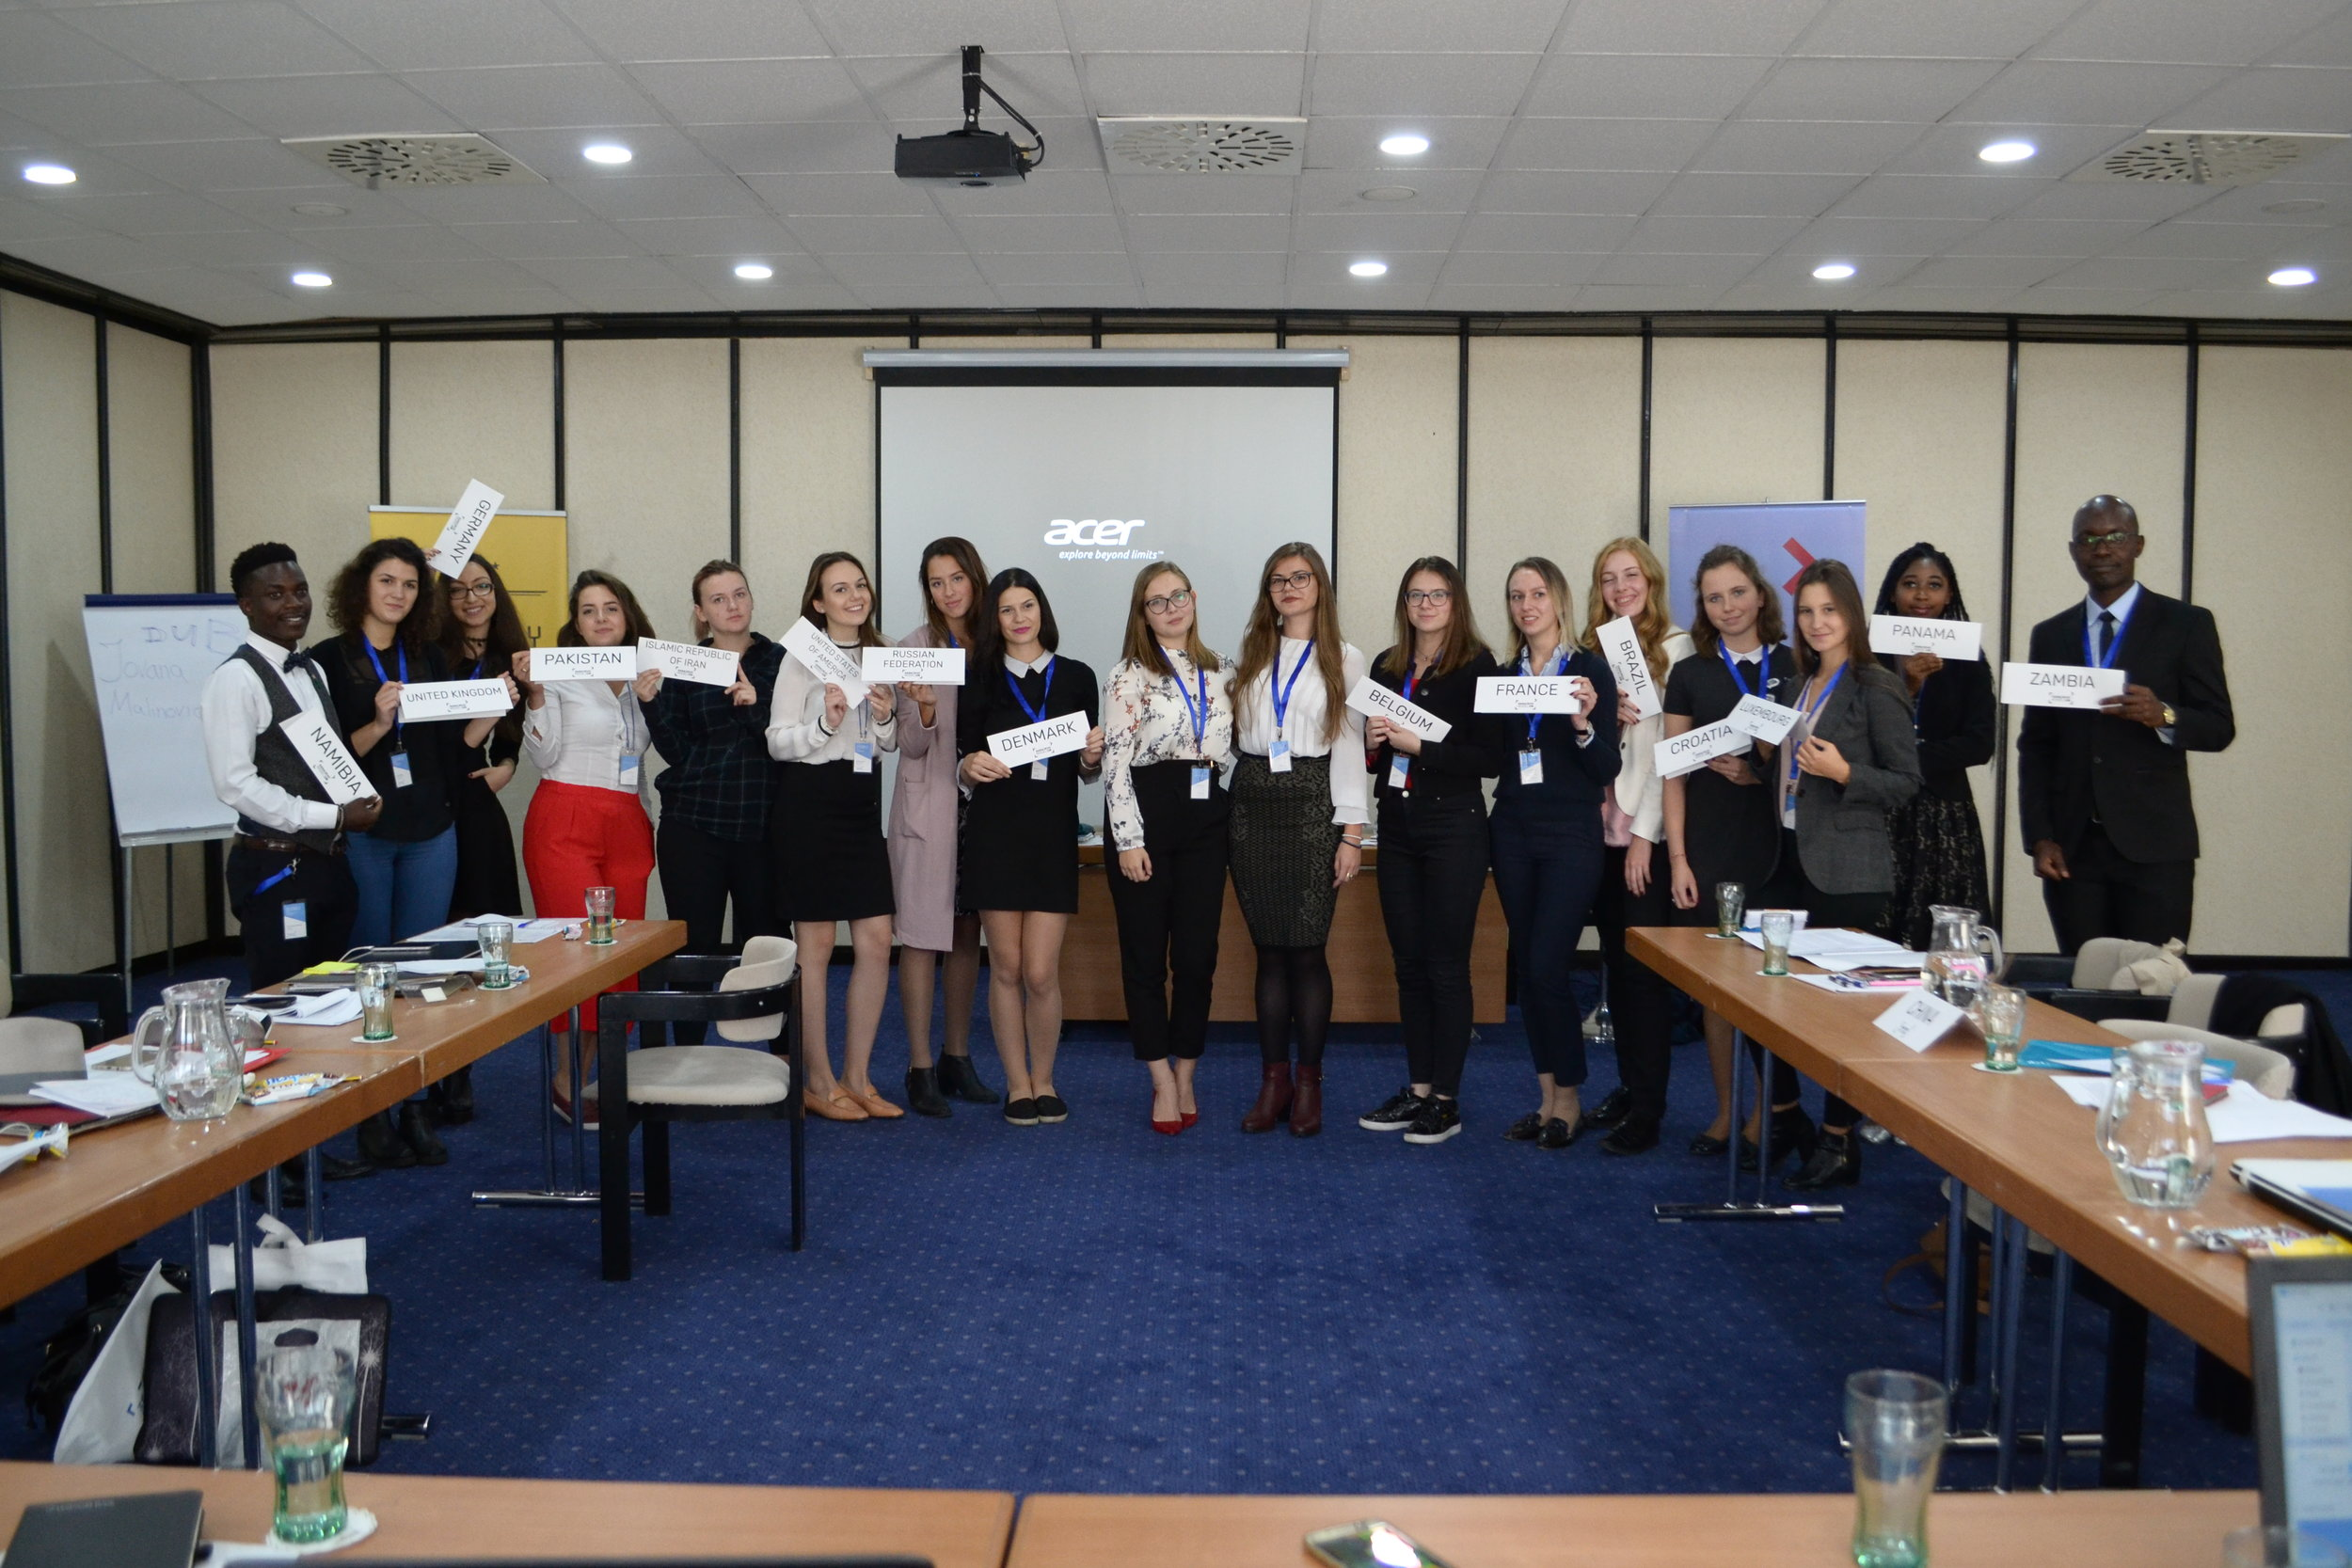 Sarajevo Model UN '17 - UN WOMEN